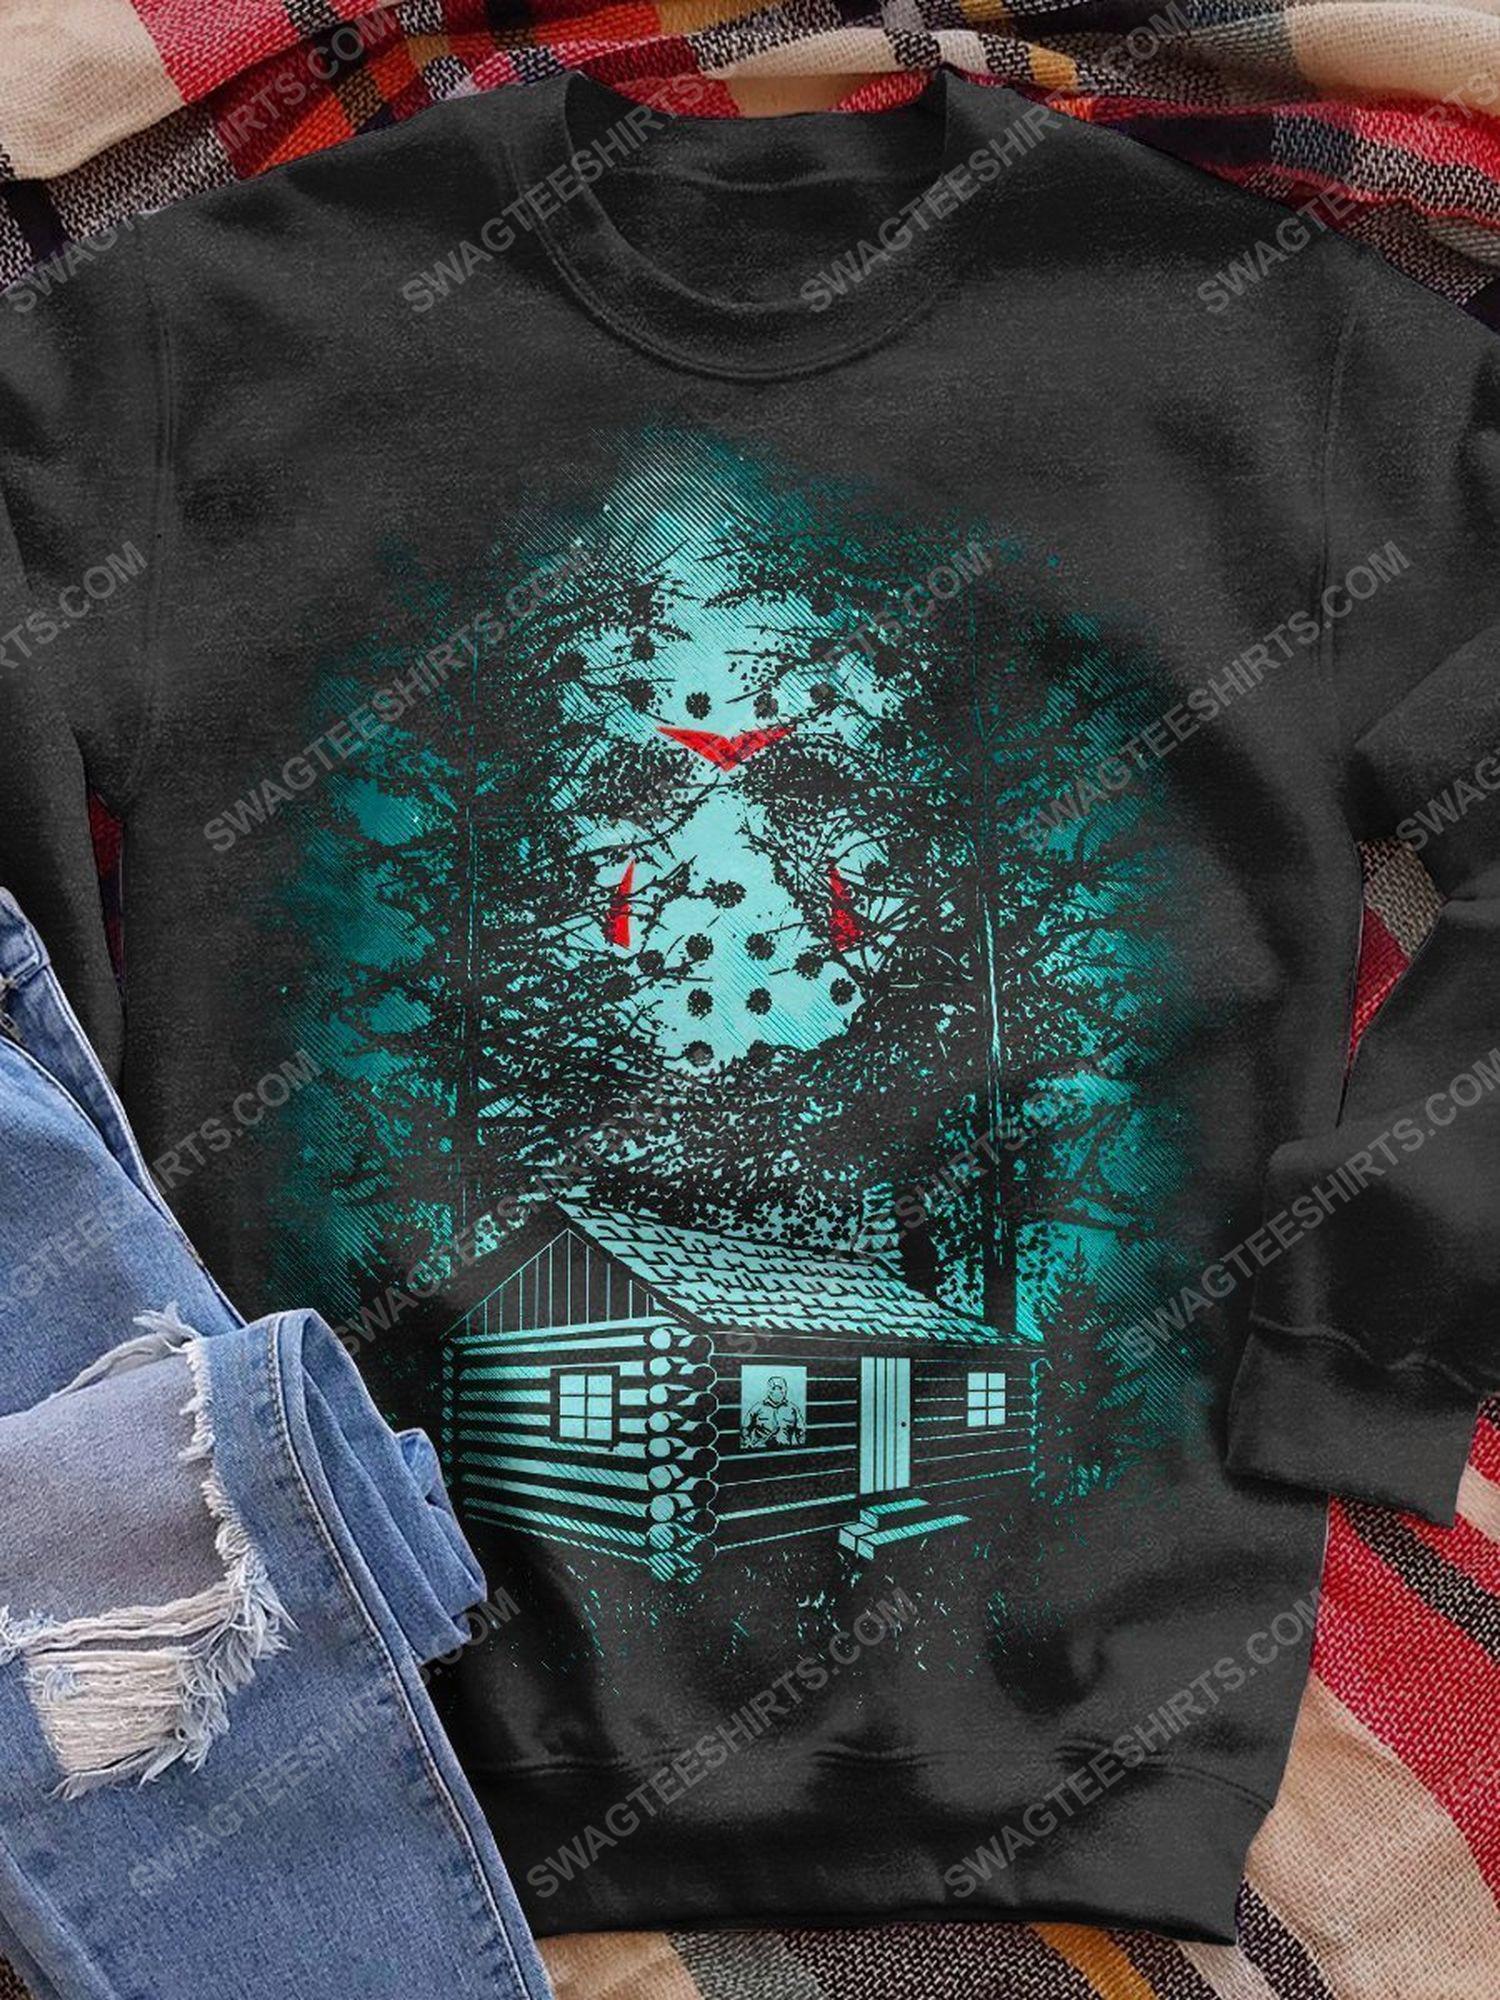 Halloween jason voorhees friday the 13th series shirt 1 - Copy